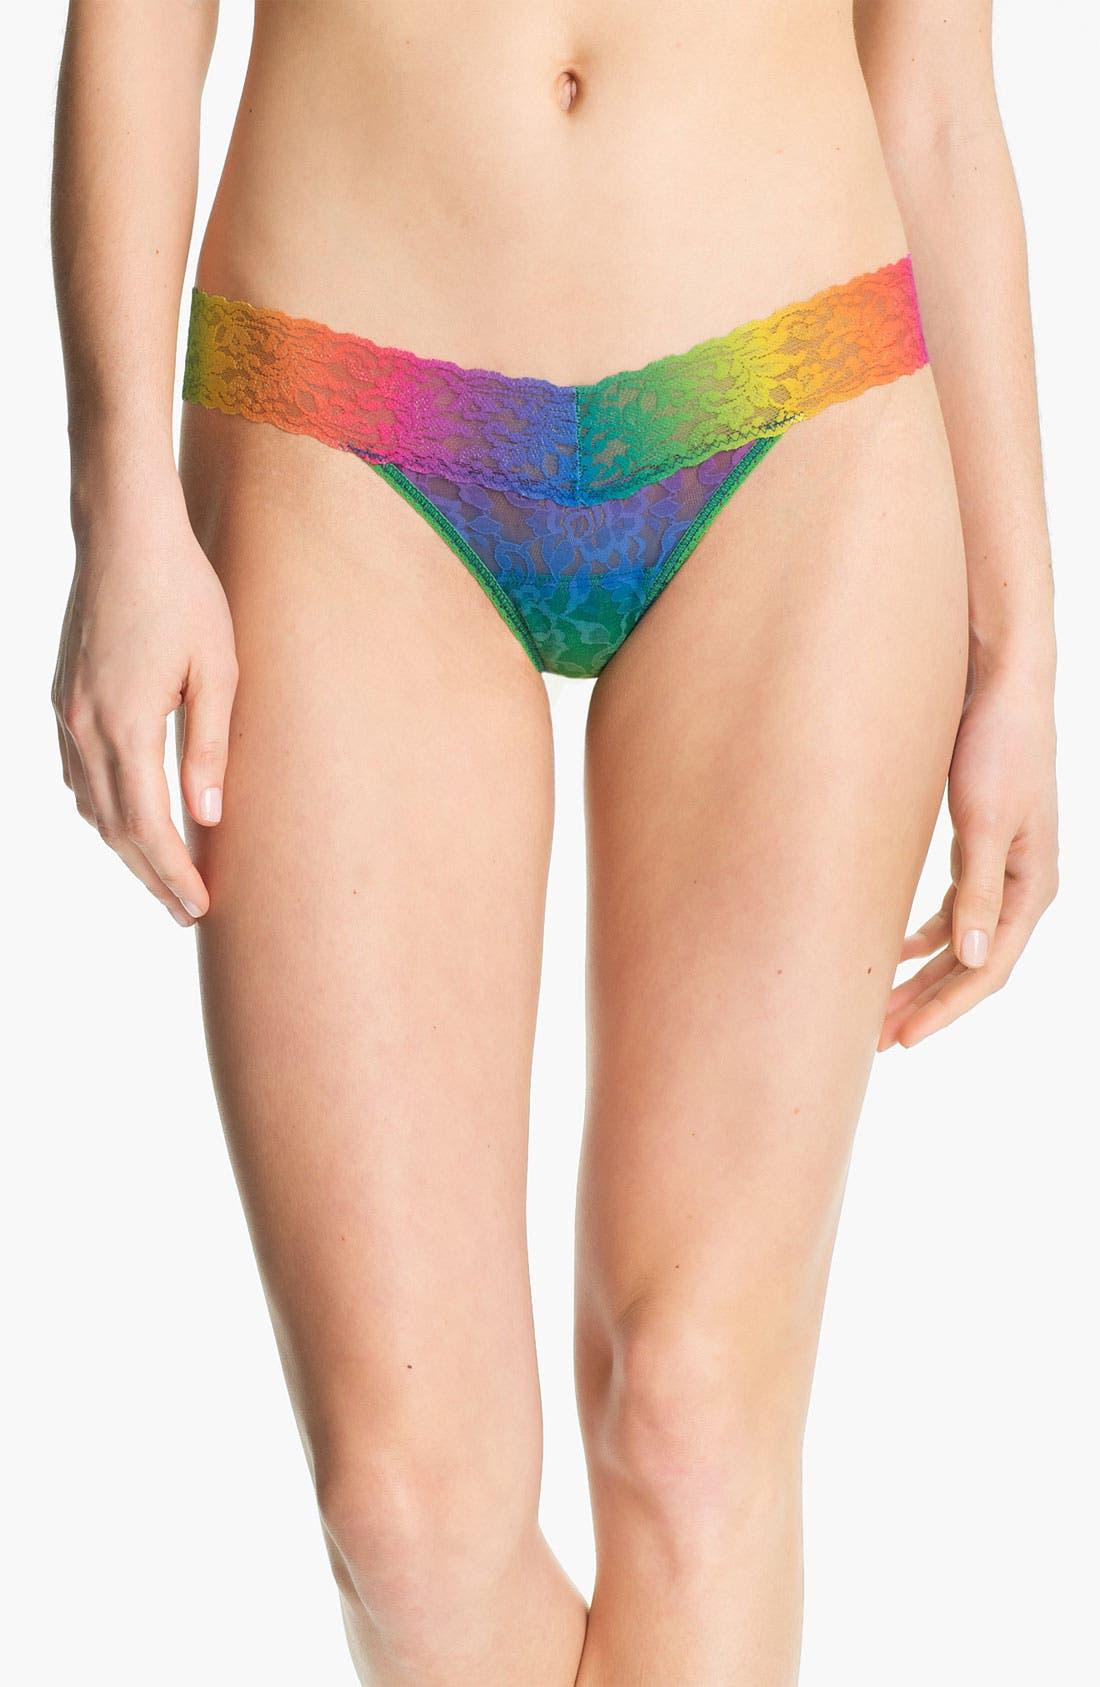 Alternate Image 1 Selected - Hanky Panky 'Rainbow' Low Rise Thong